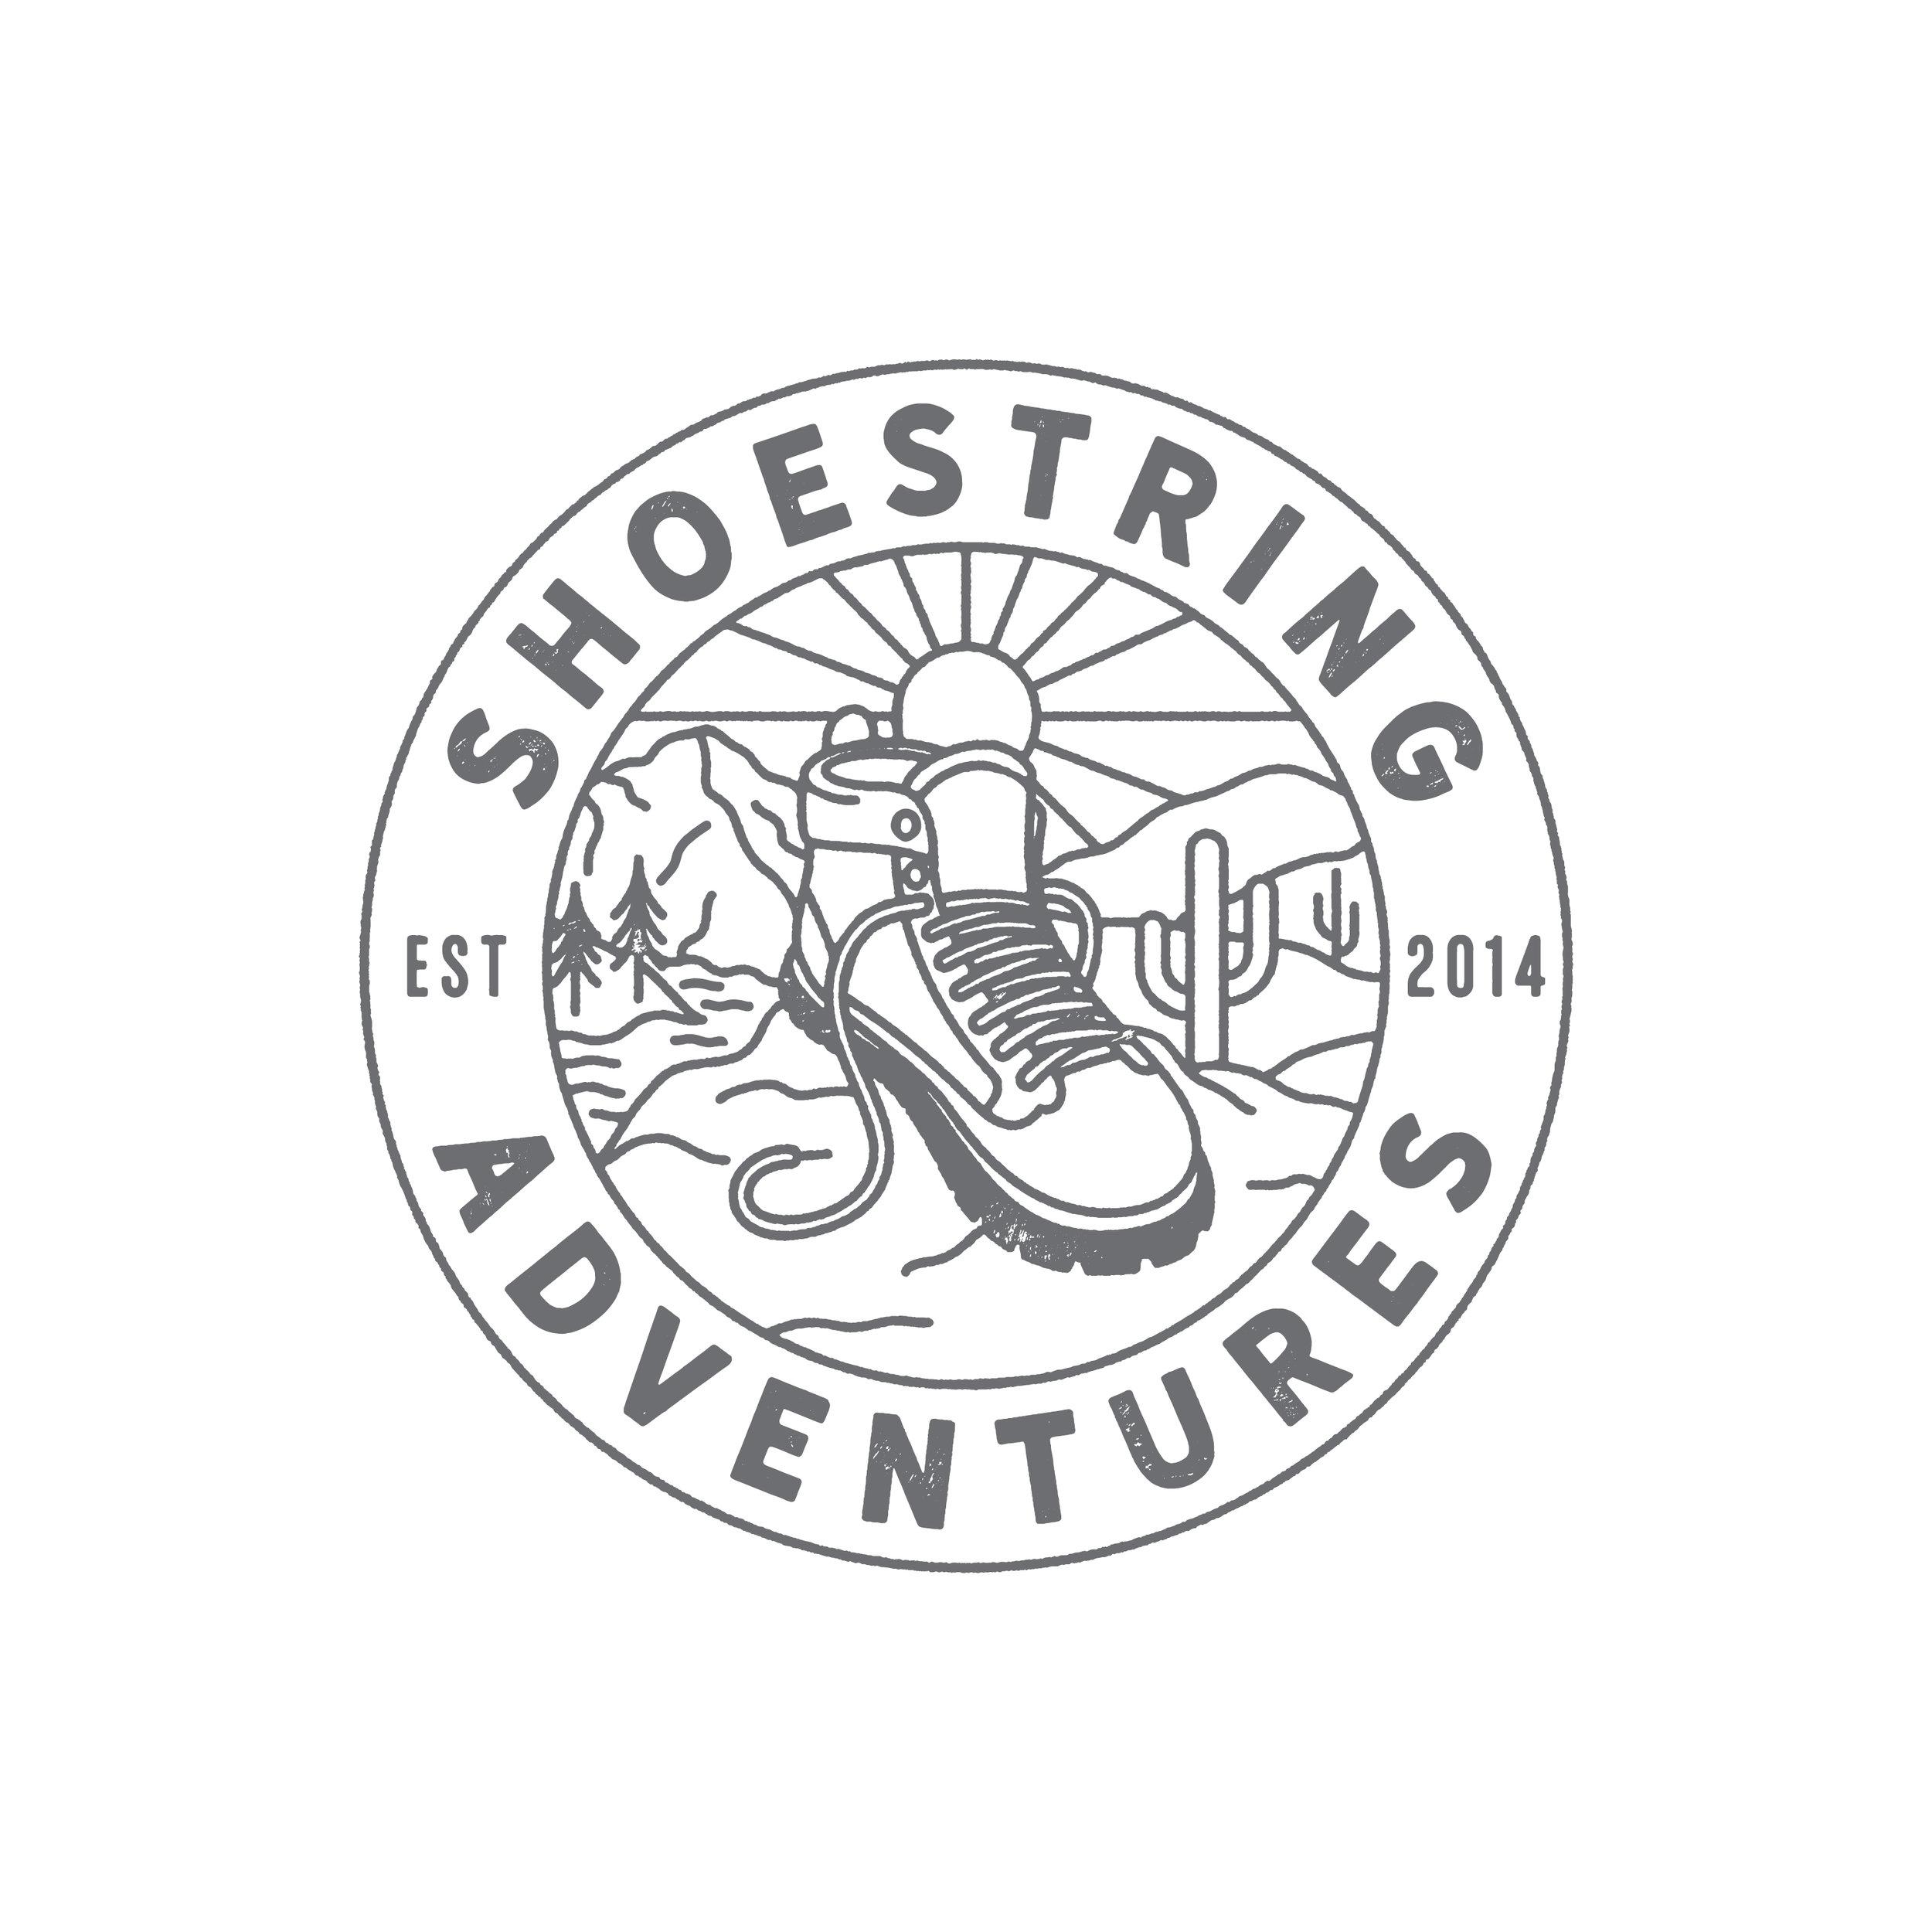 ShoestringAdventures-01.jpg